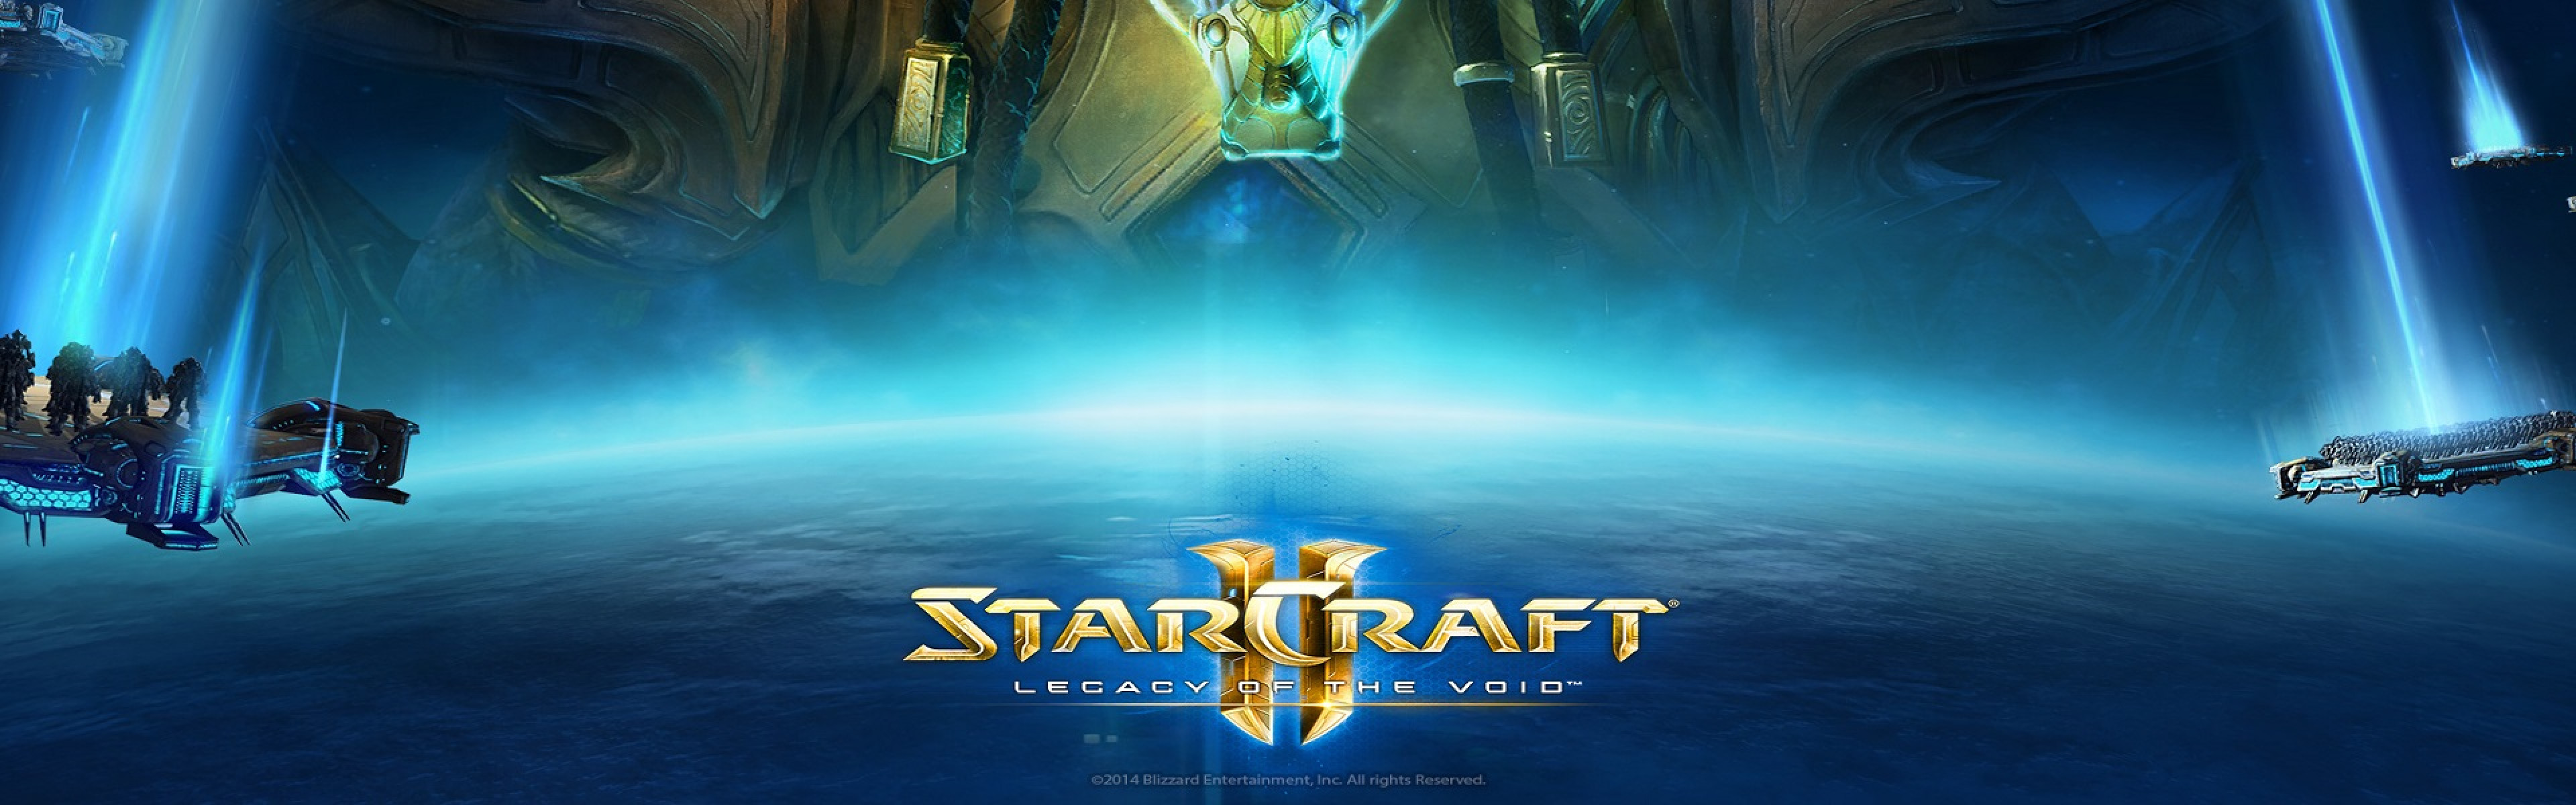 Starcraft 2 Background 76 Pictures